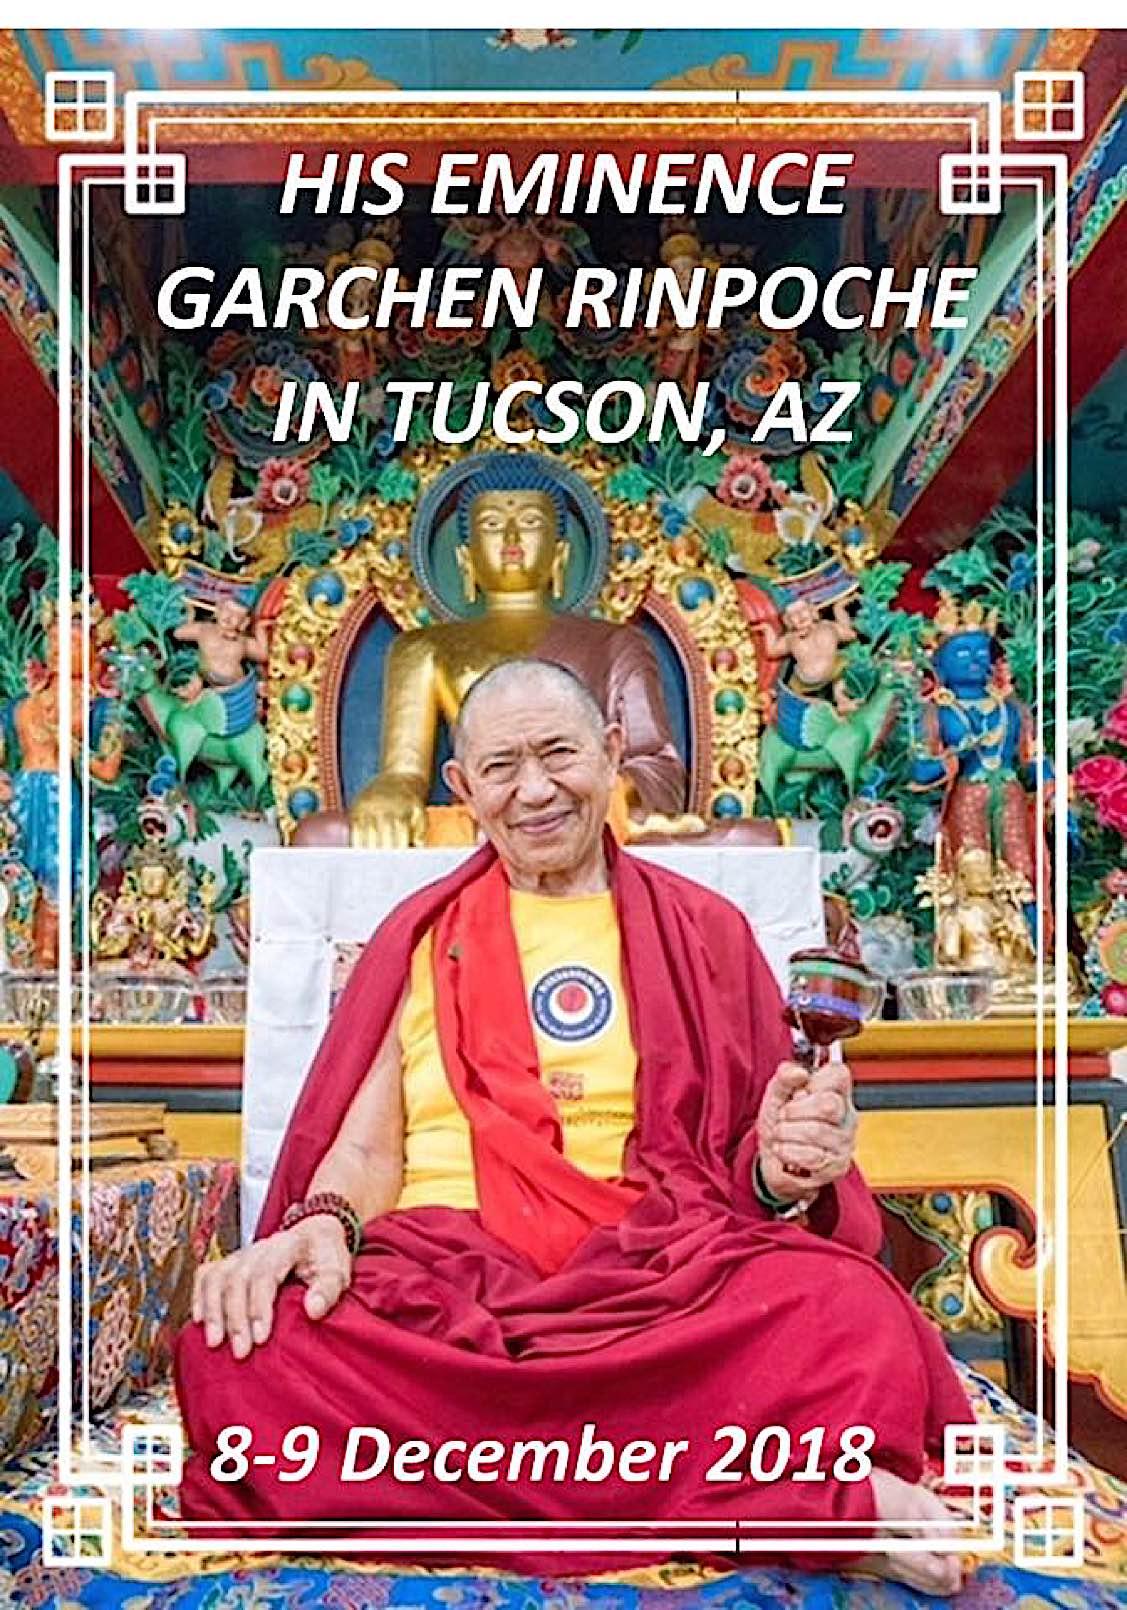 Buddha Weekly His Eminence Garchen Rinpoche in Tuscon Arizona devent Buddhism